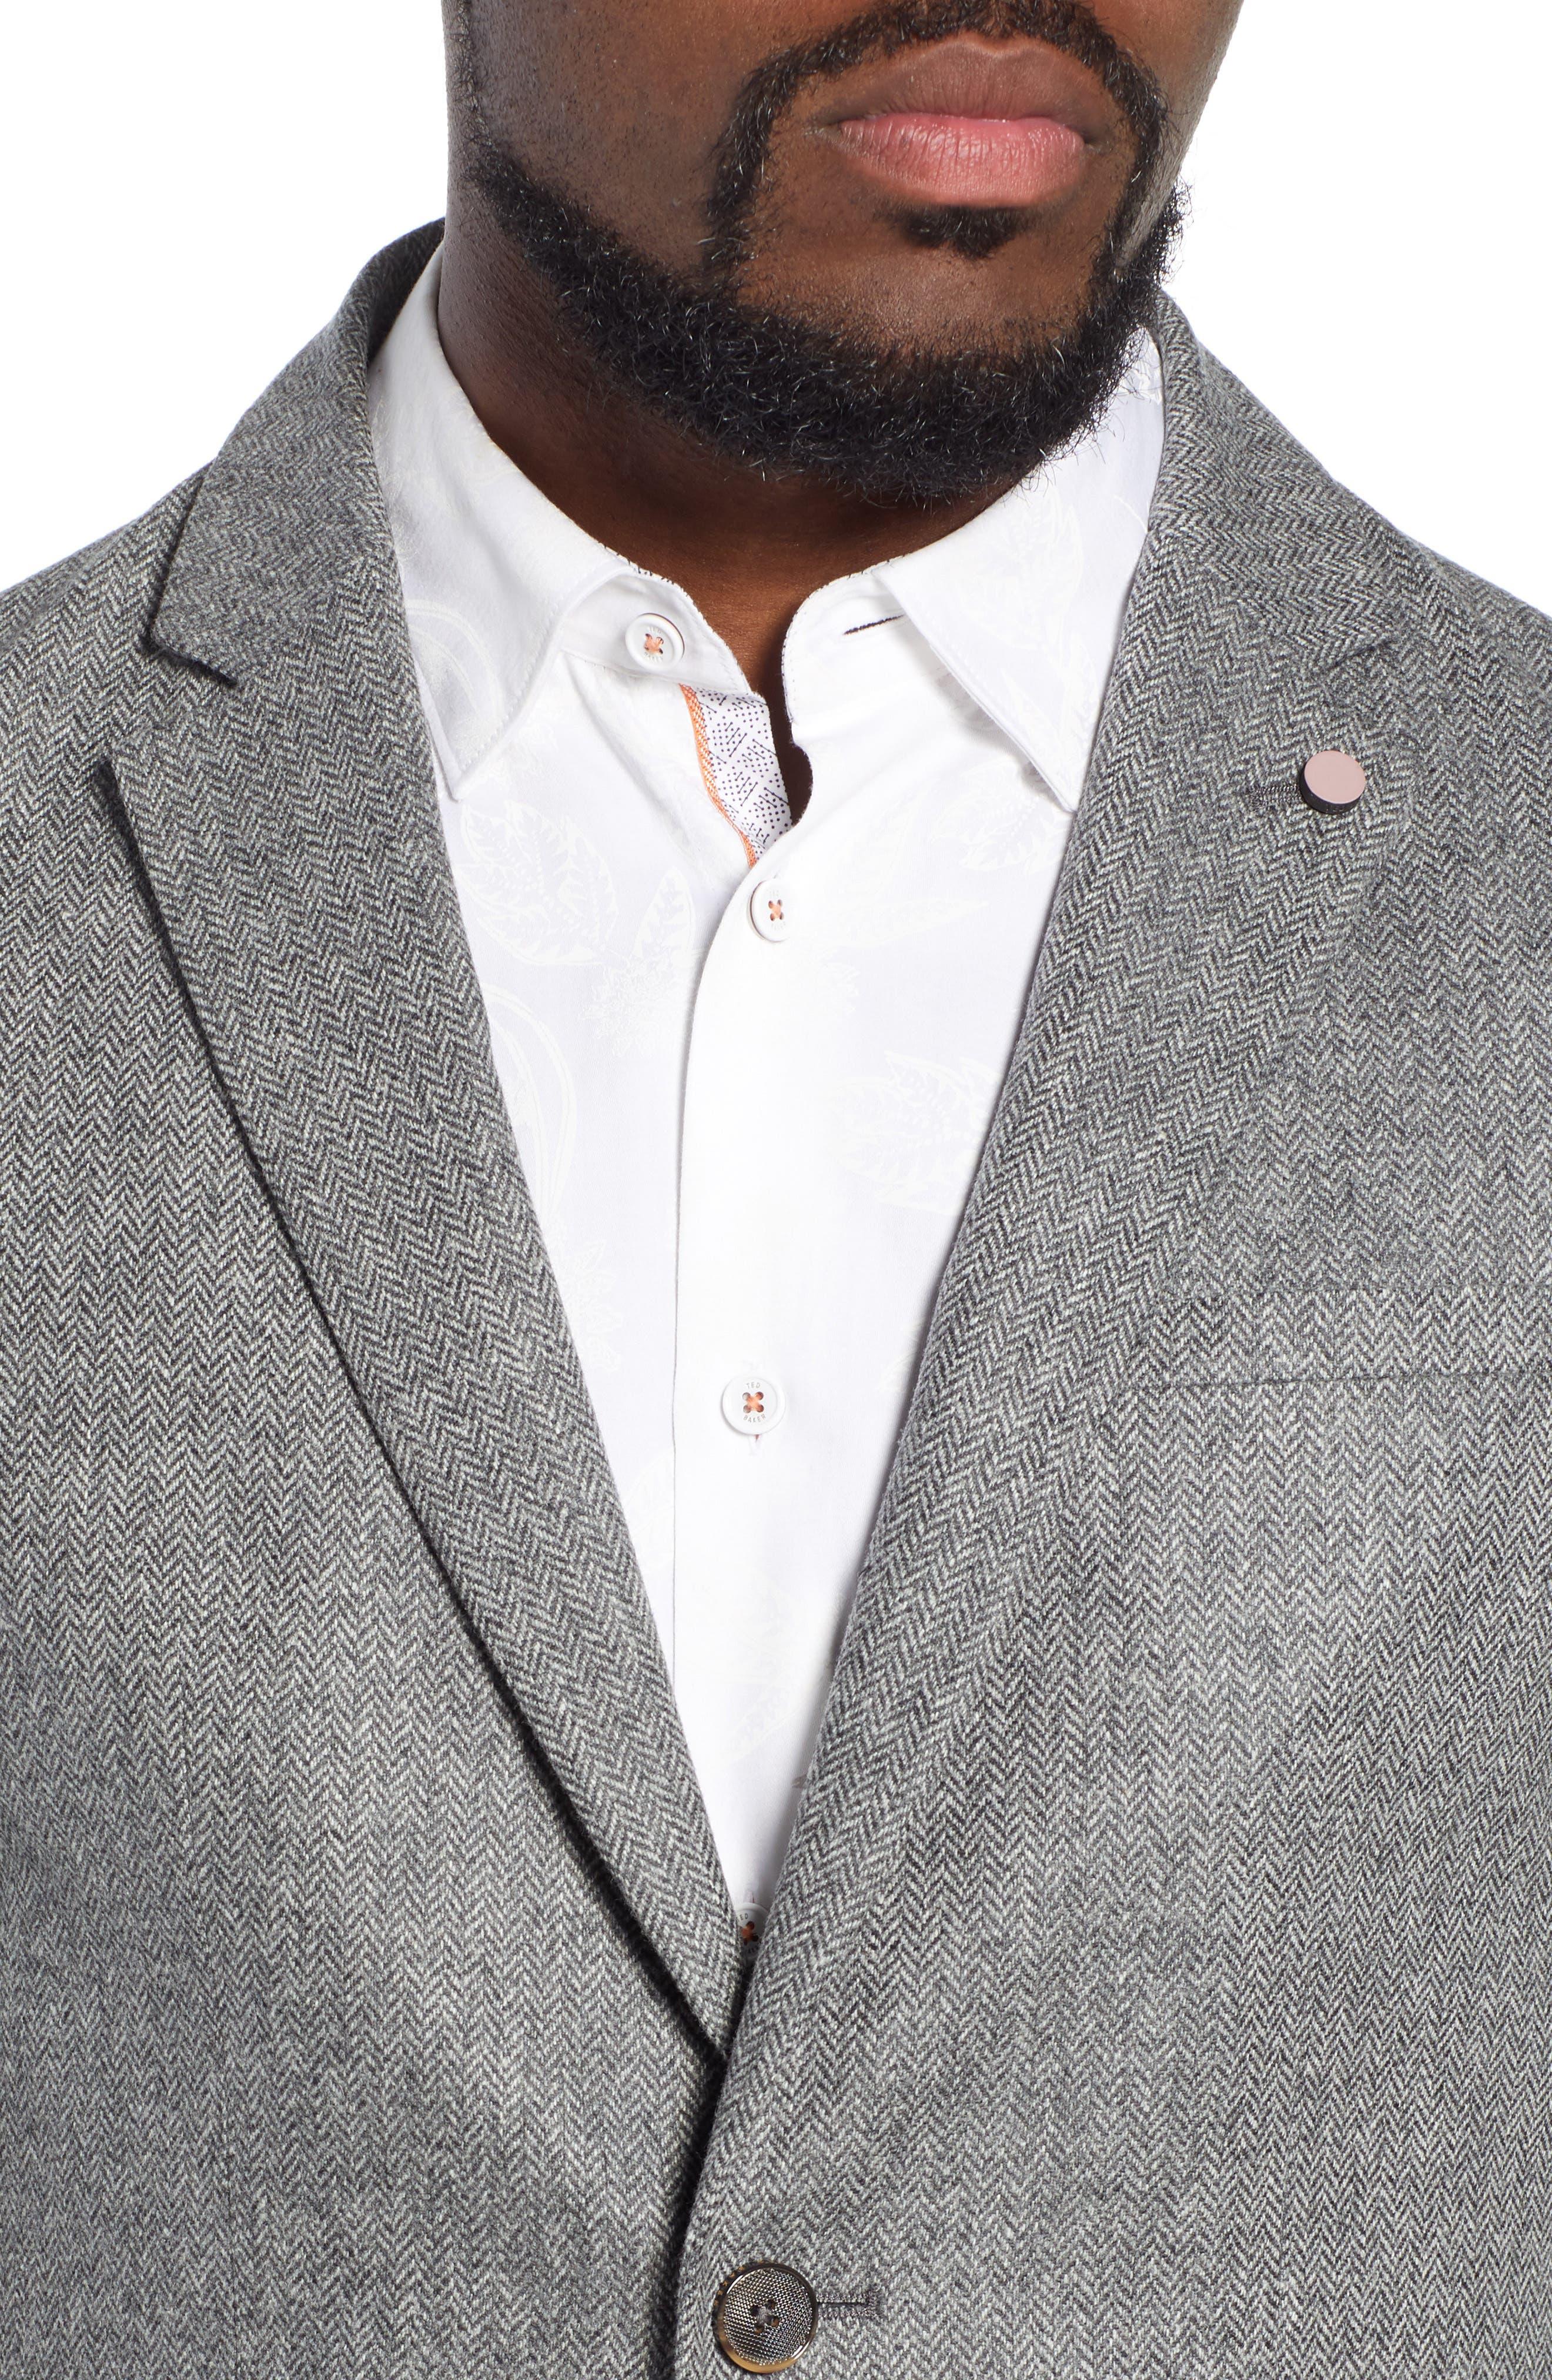 Dual Look Herringbone Jacket,                             Alternate thumbnail 4, color,                             LIGHT GREY